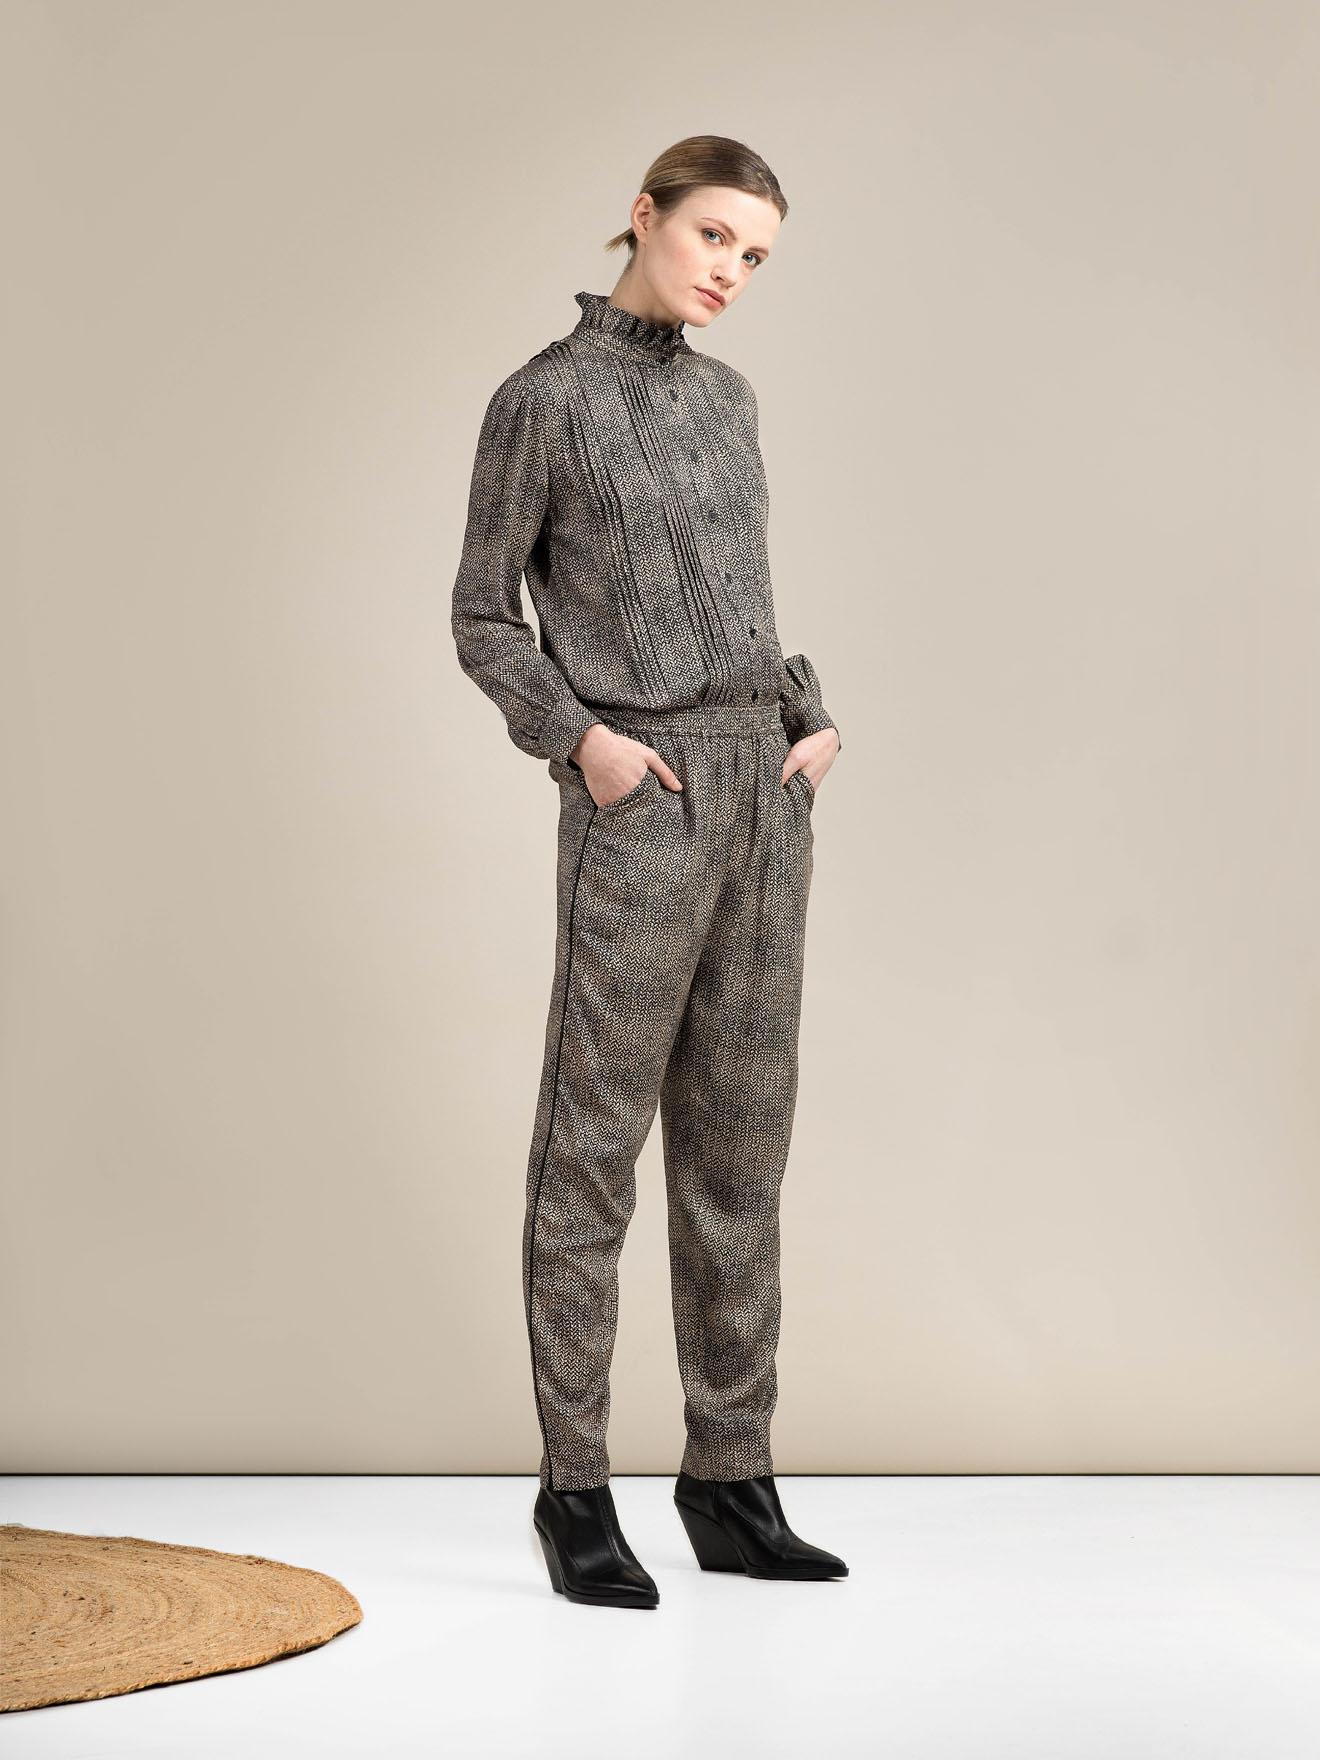 inghinn-broek-alchemist-fashion